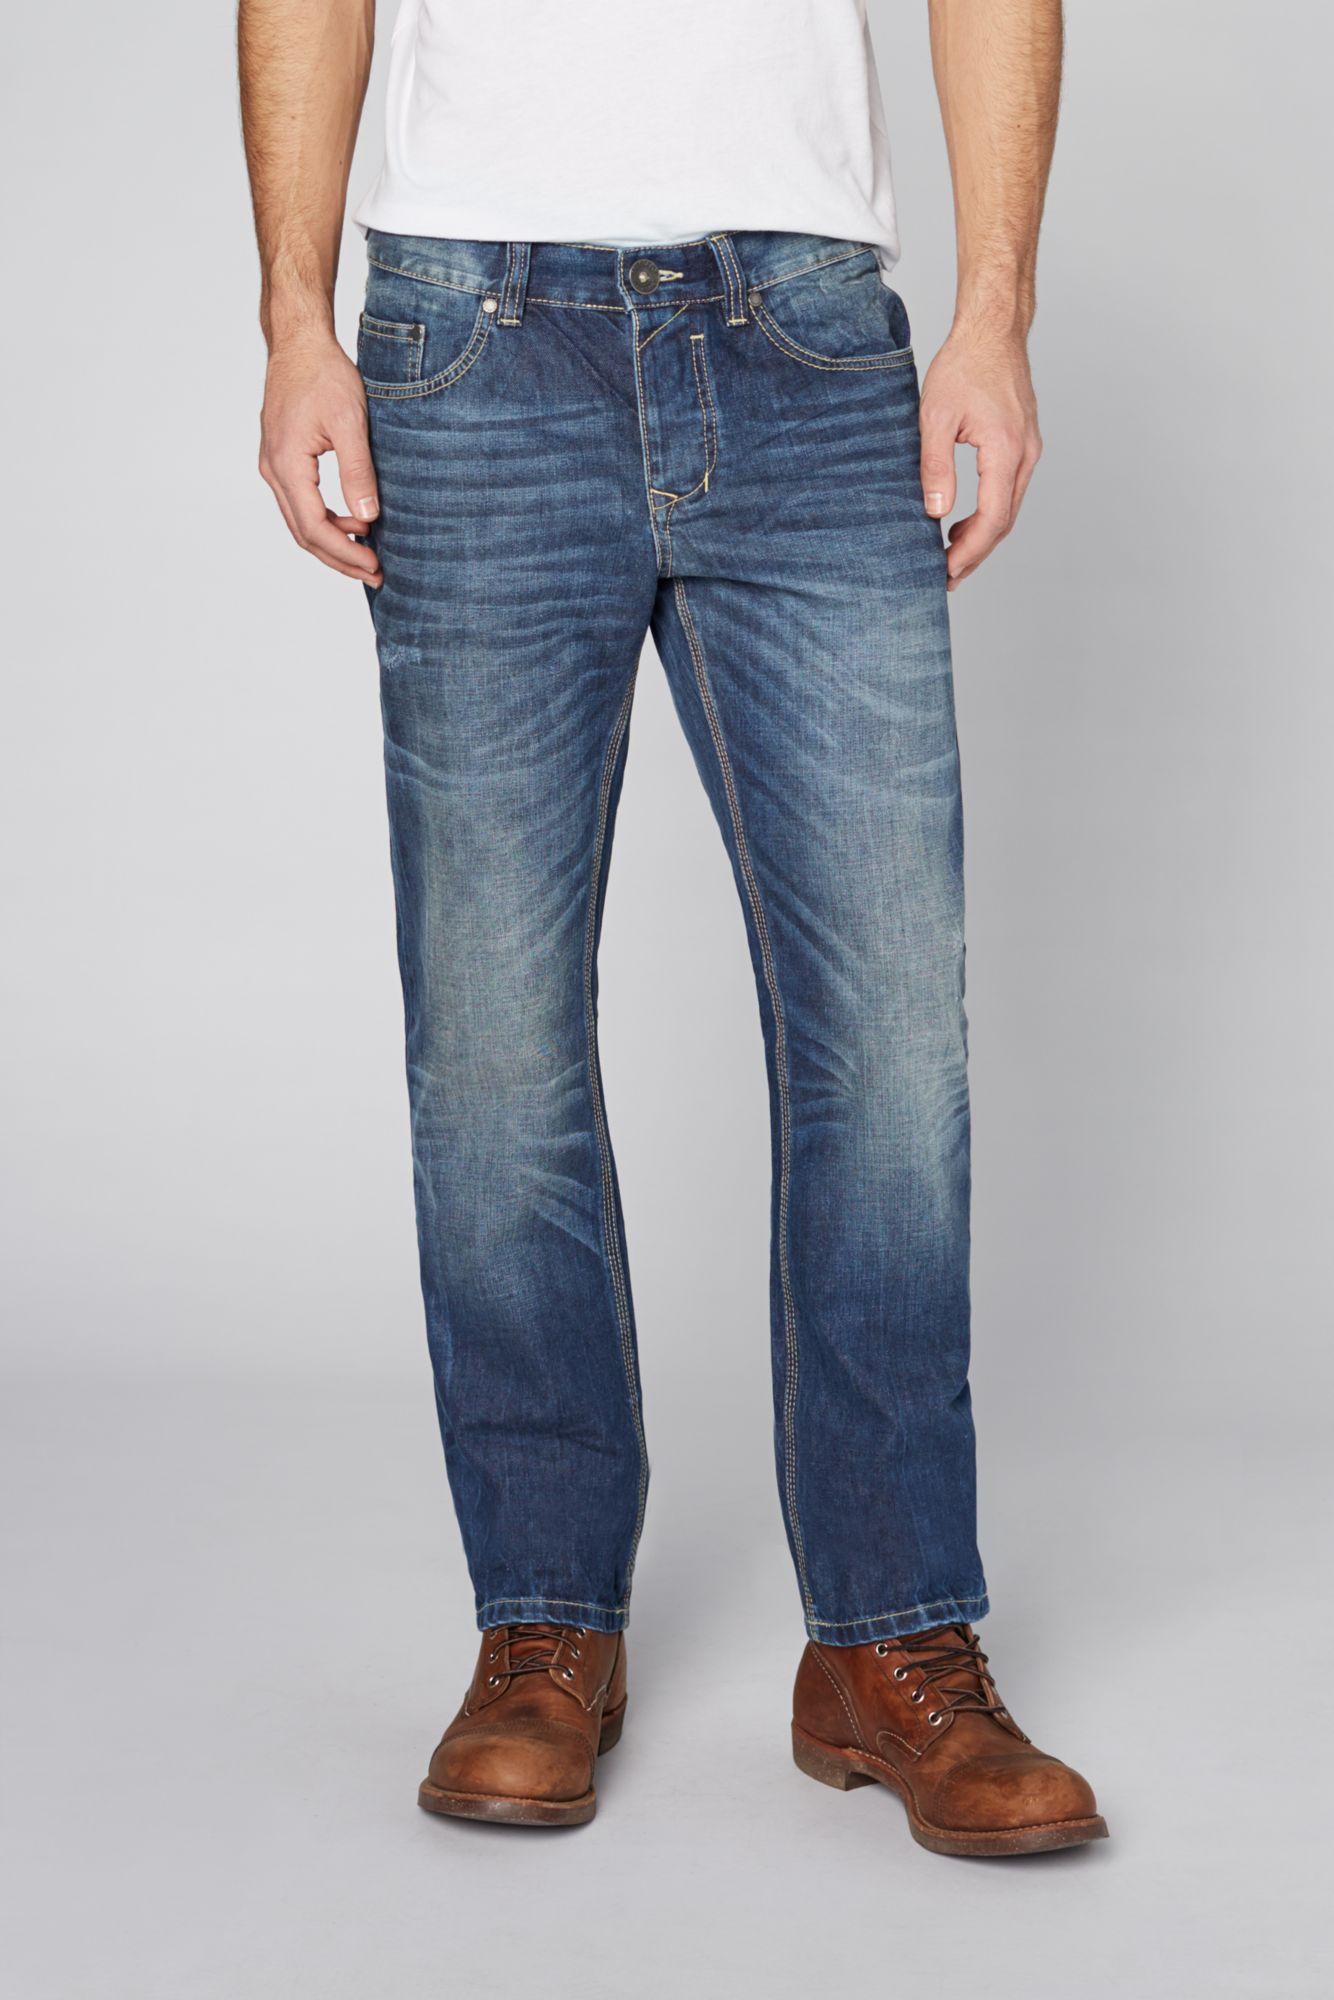 COLORADO DENIM  Jeans »C941 STRAIGHT FIT Herren Jeans«